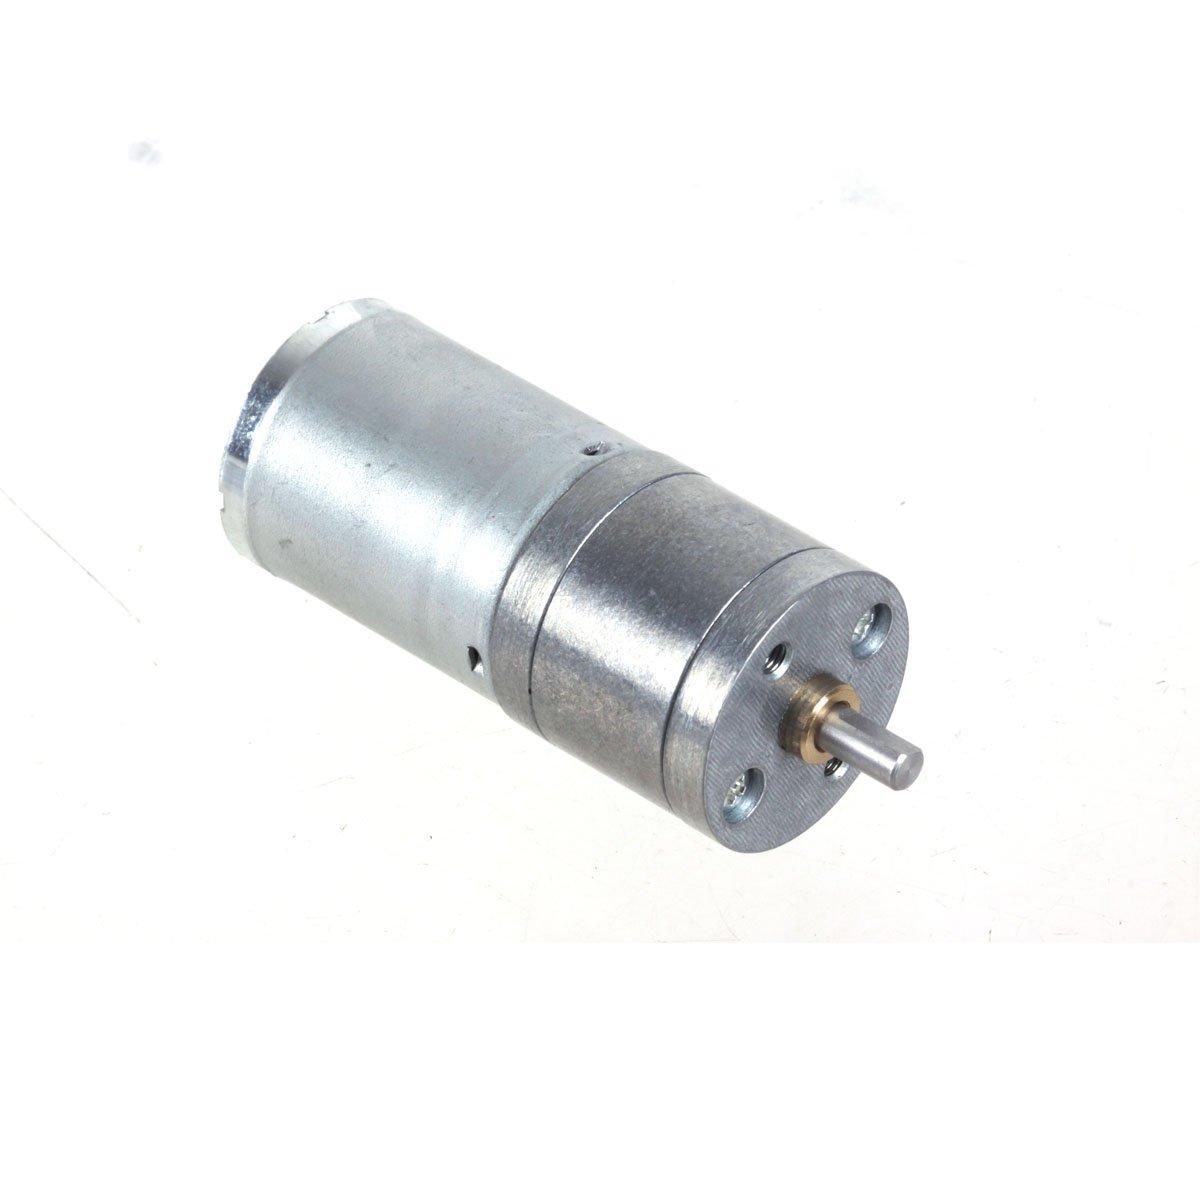 DC 12V 160mA 150RPM 2.04Kg-cm High Torque Permanent Magnetic DC Gear Motor